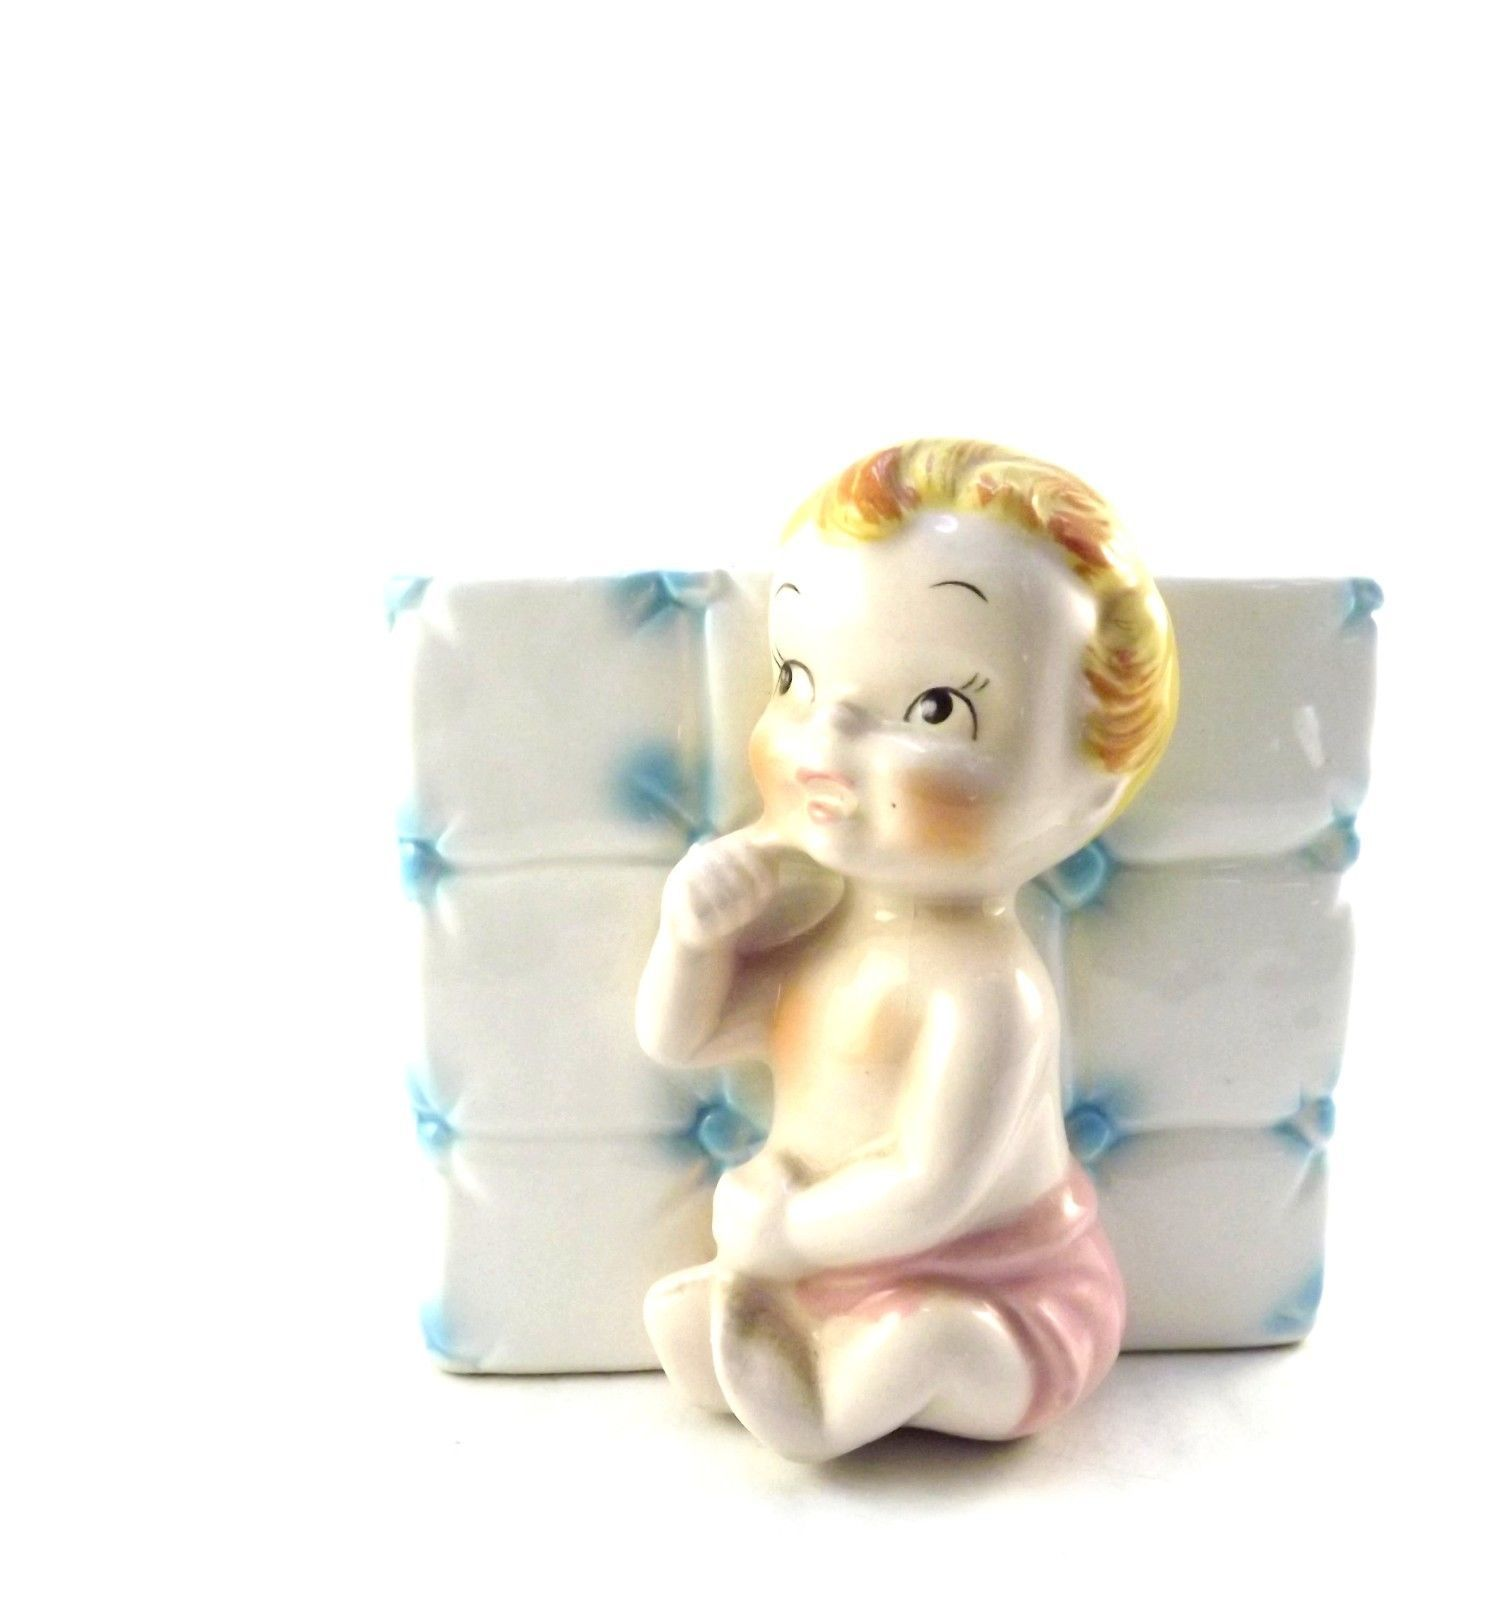 Baby Nursery Planter Vase Vintage Napco Collectible Glass Blue It's a Boy K2847 - $24.00